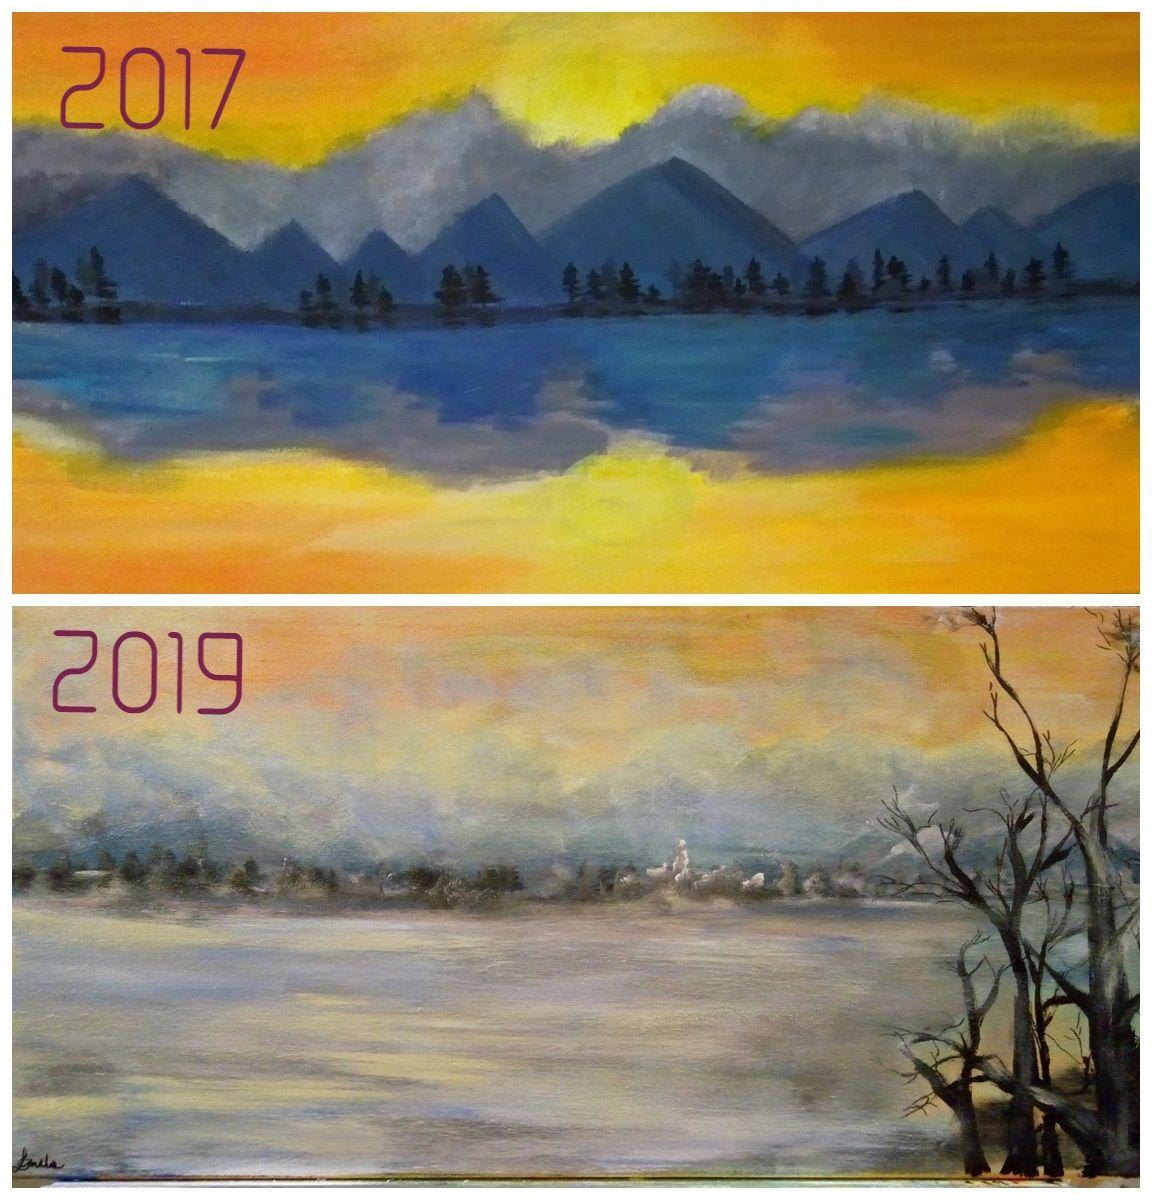 malarstwo amatorskie